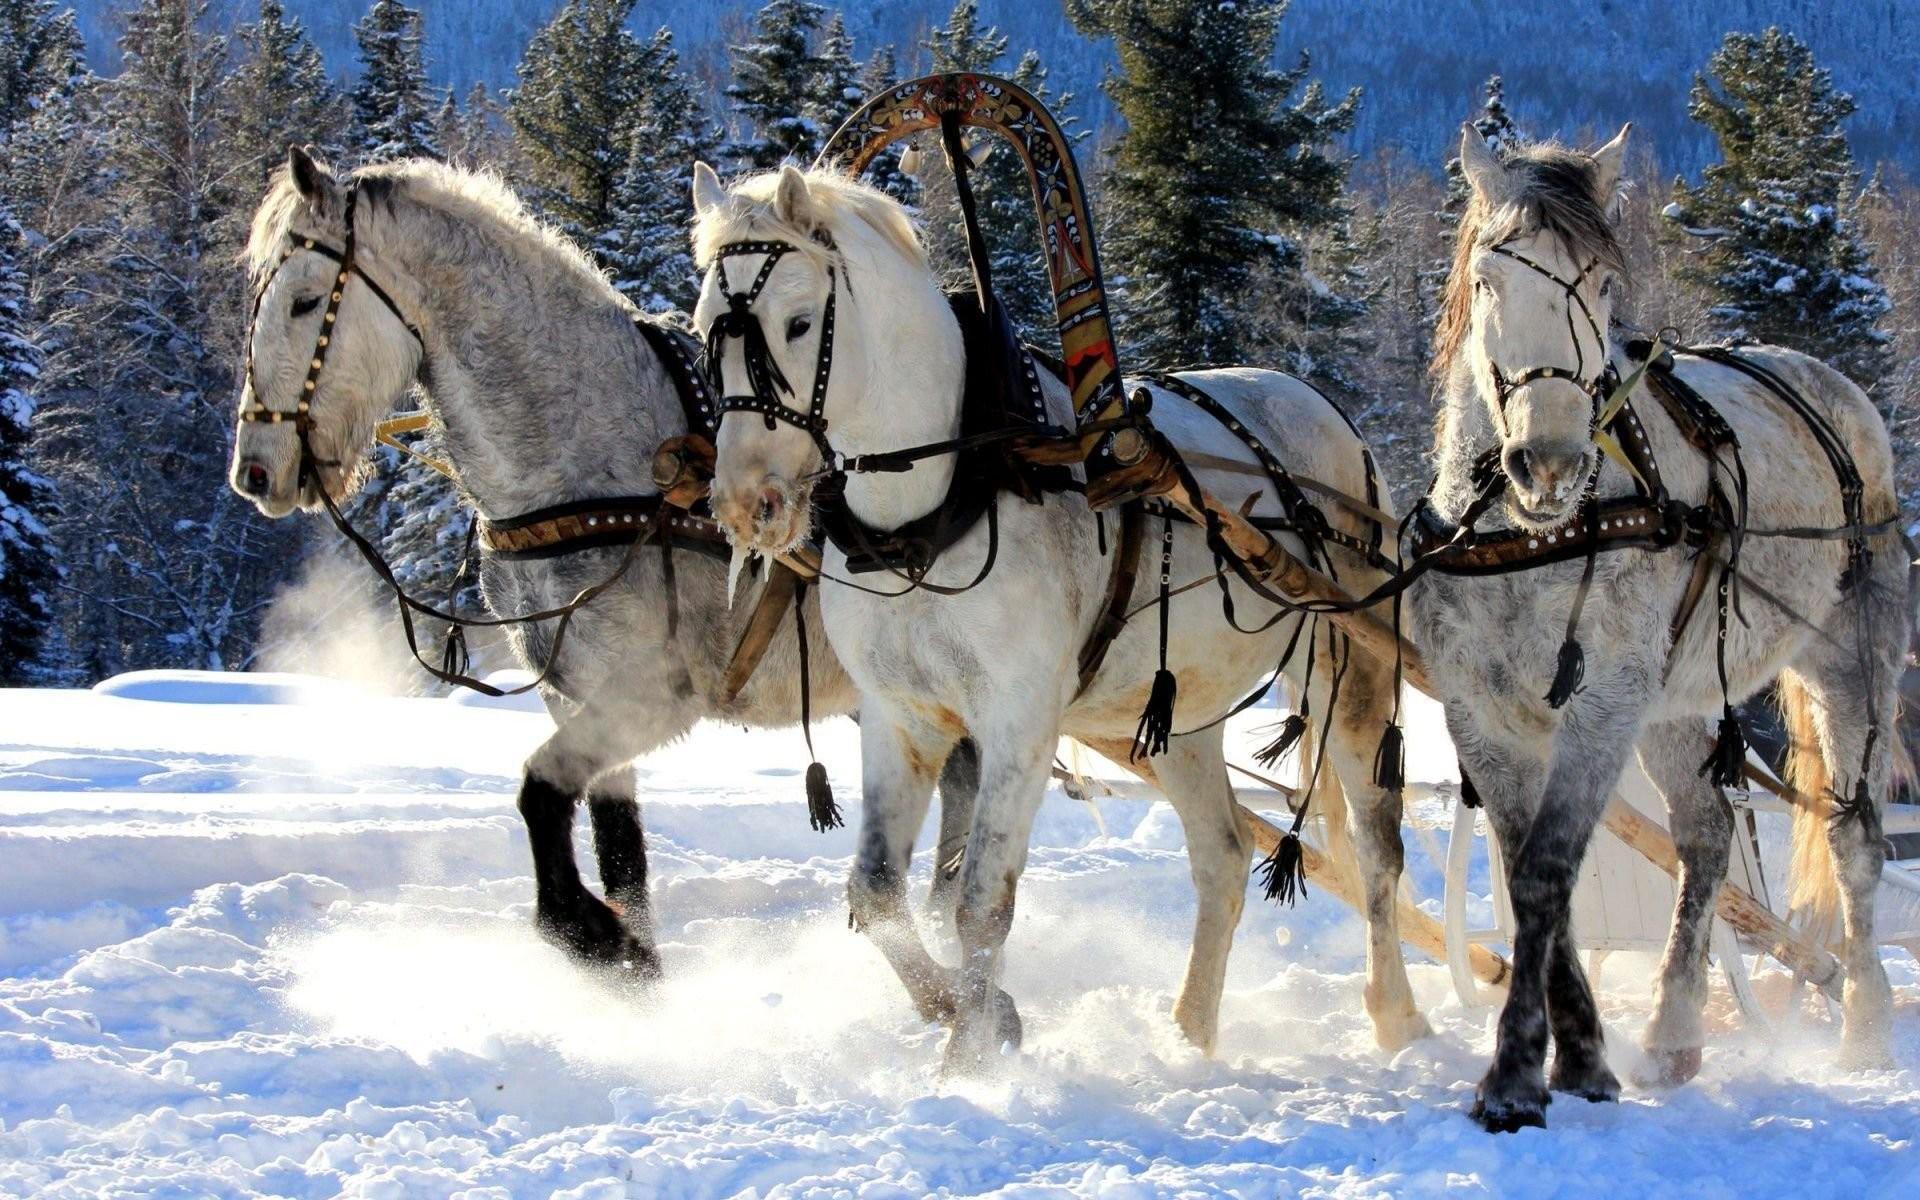 Winter snow nature landscape horse horses wallpaper | | 866081 |  WallpaperUP